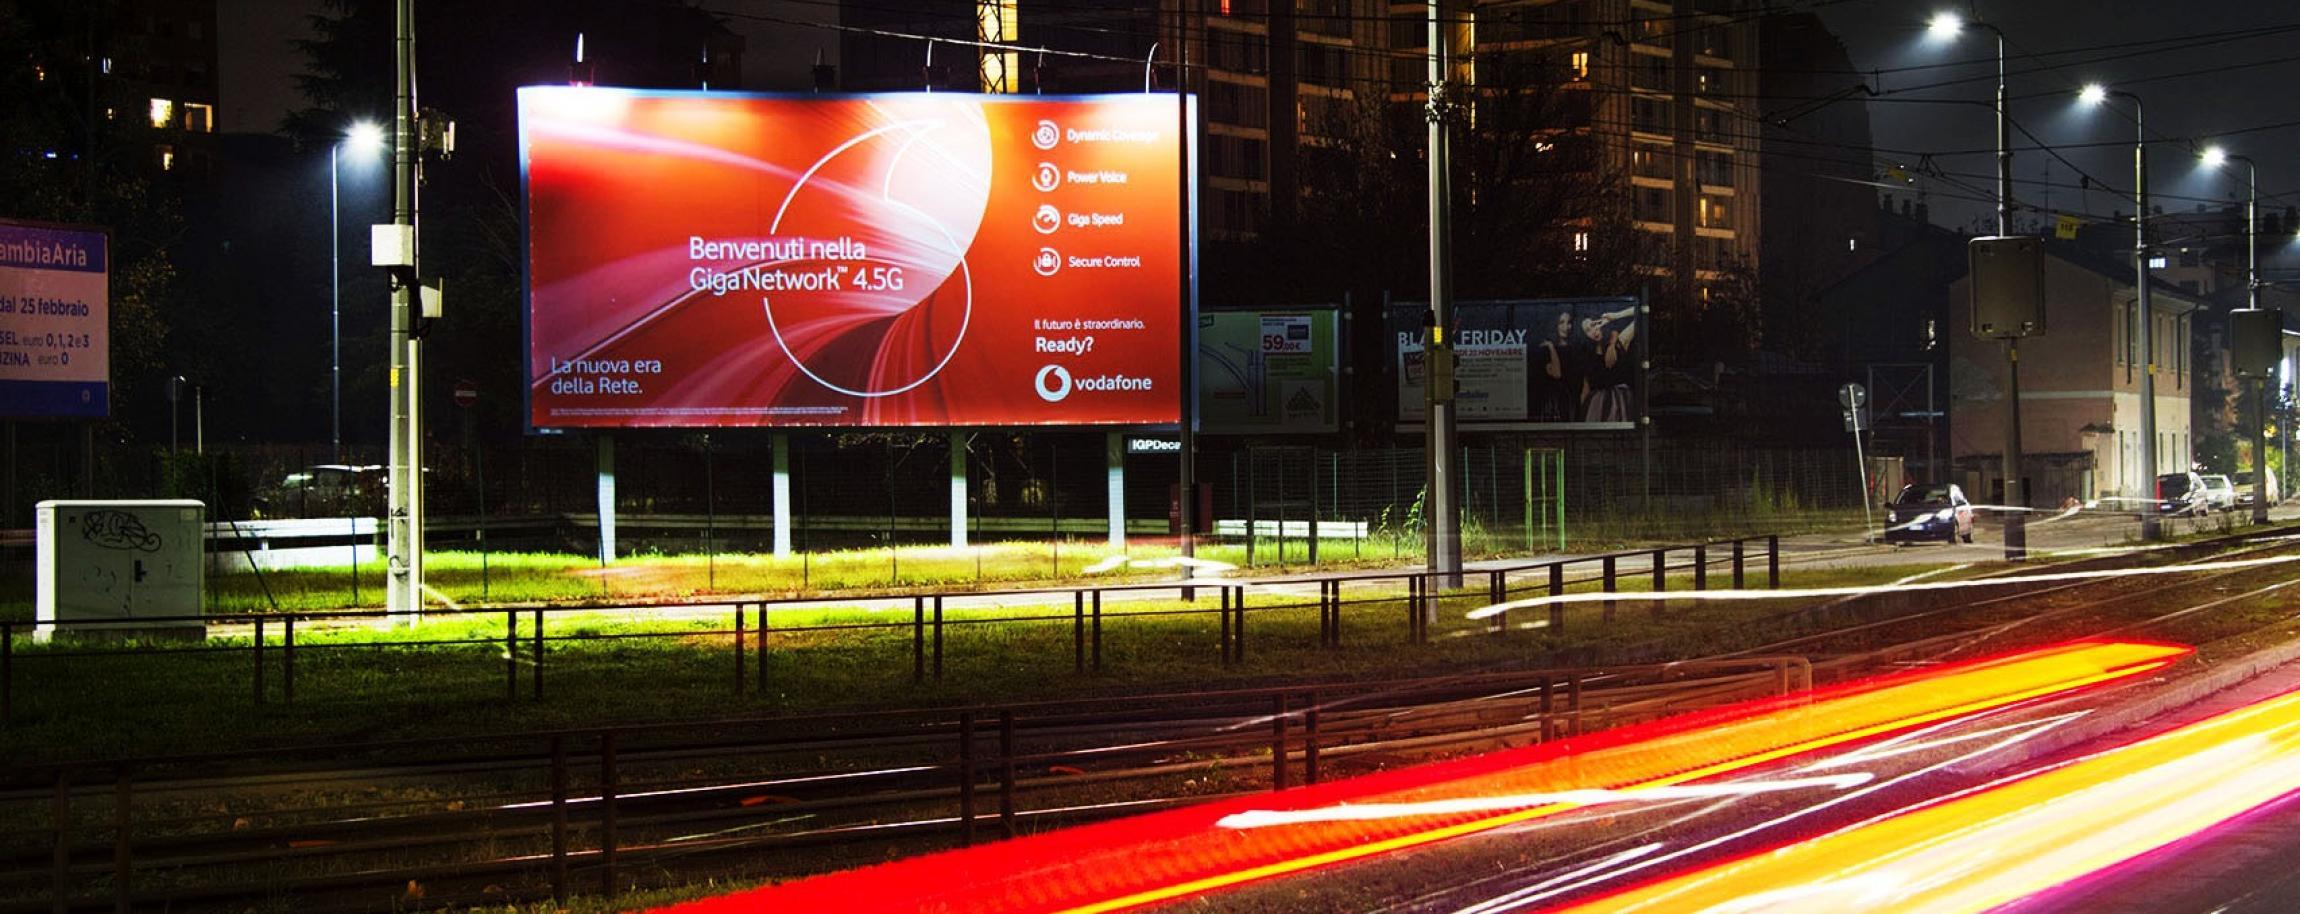 Vodafone GigaNet, poster Milano